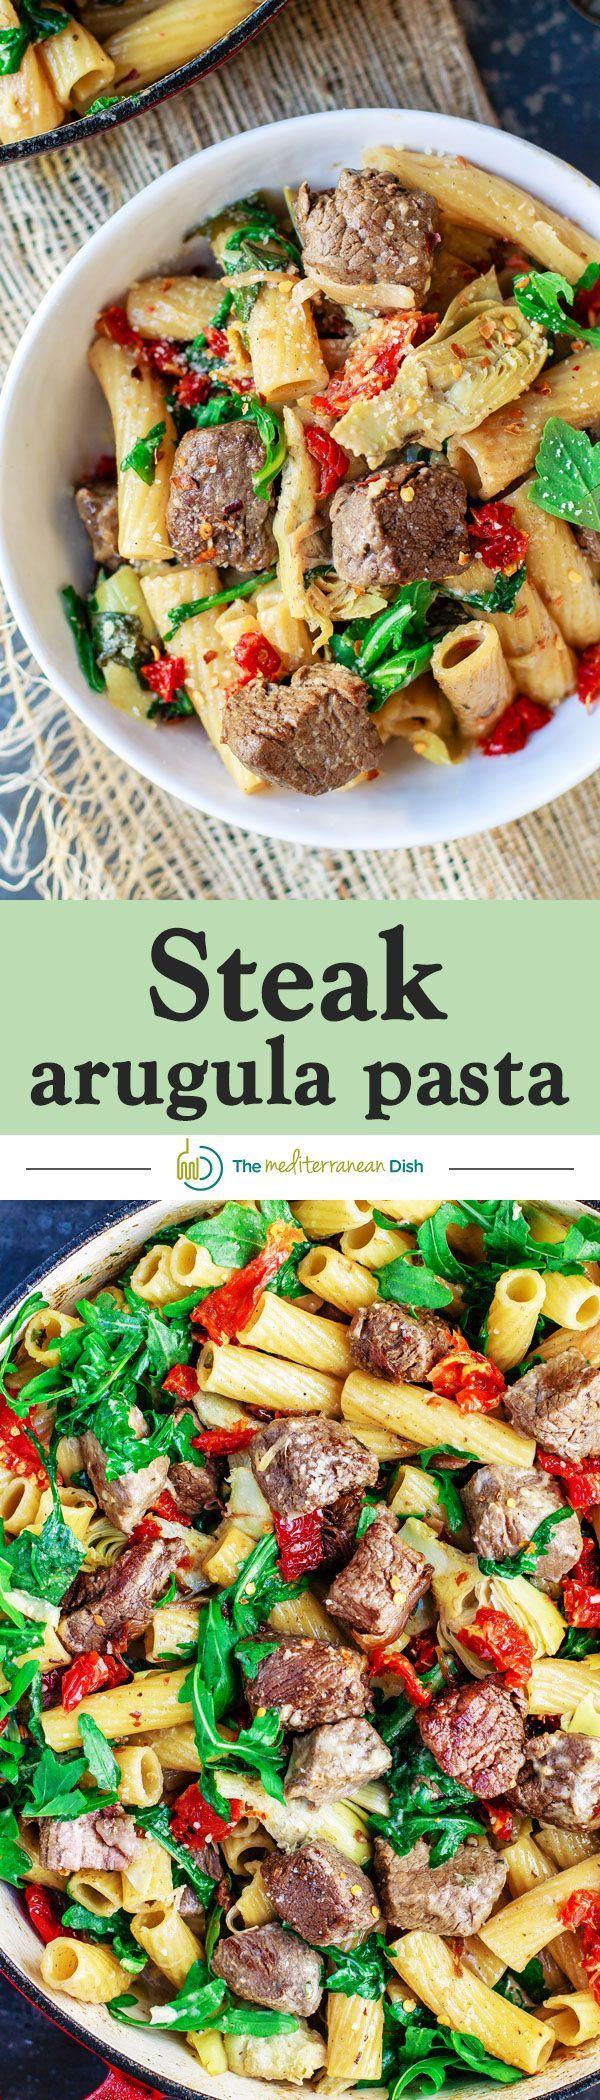 Steak Arugula Pasta with Garlic White Wine Sauce - A 30-minute one-pan wonder with tenderloin steak, arugula, artichokes, sun-dried tomato and more!